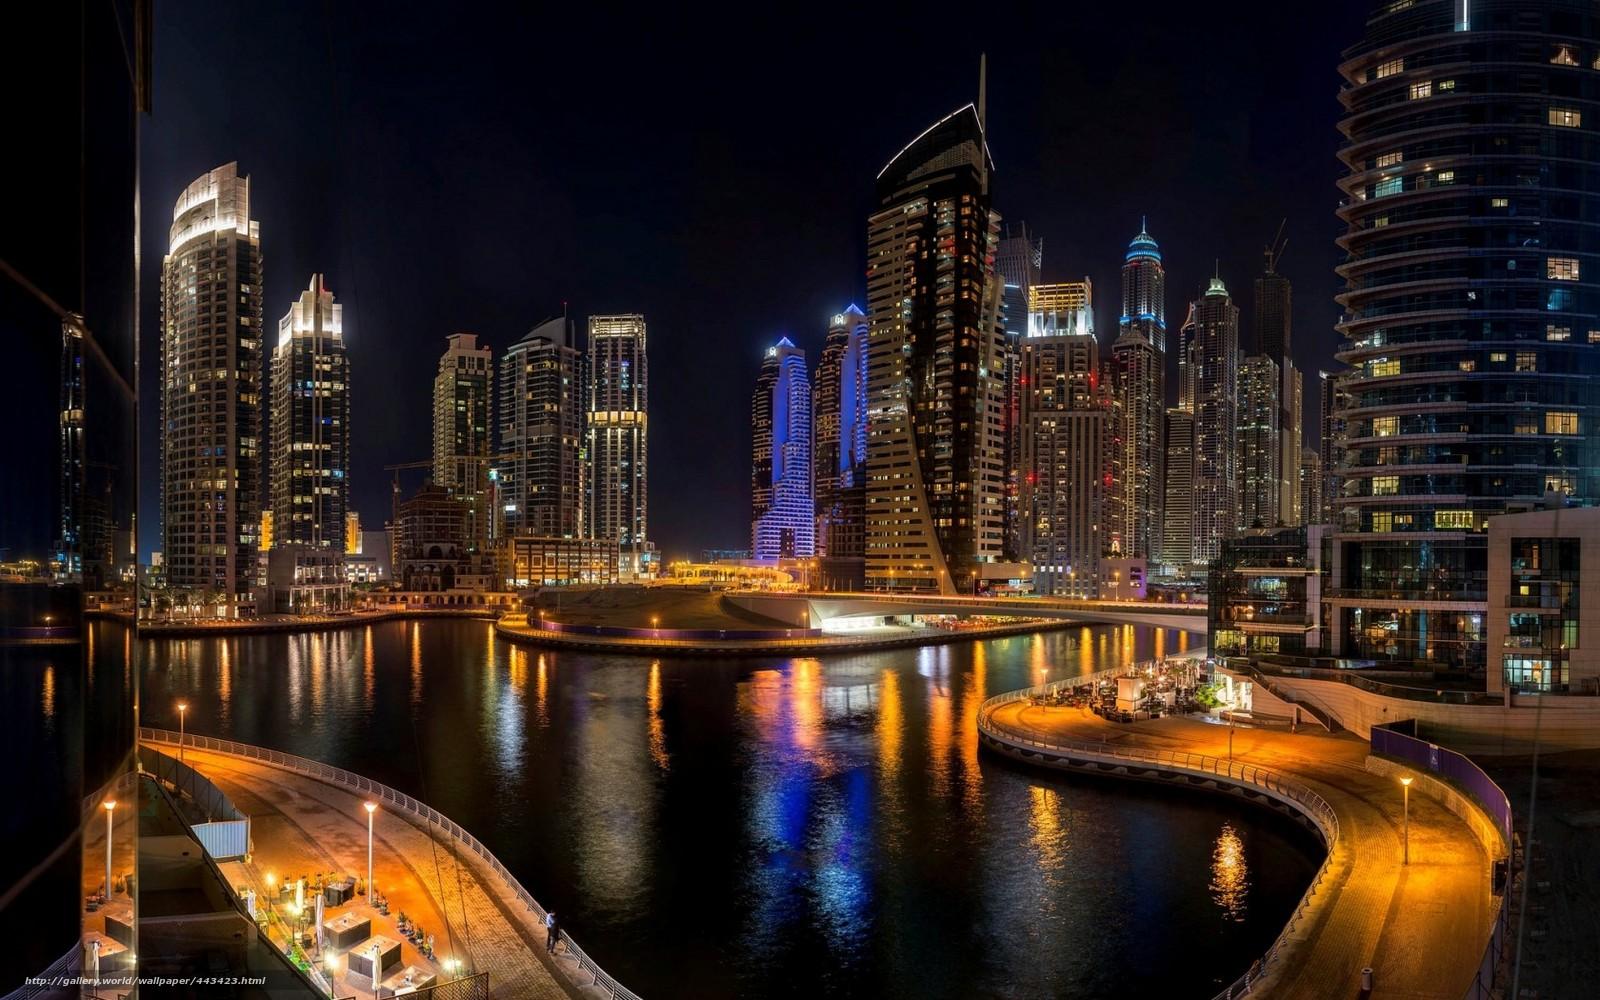 Download wallpaper Dubai dubai UAE city desktop wallpaper in 1600x1000